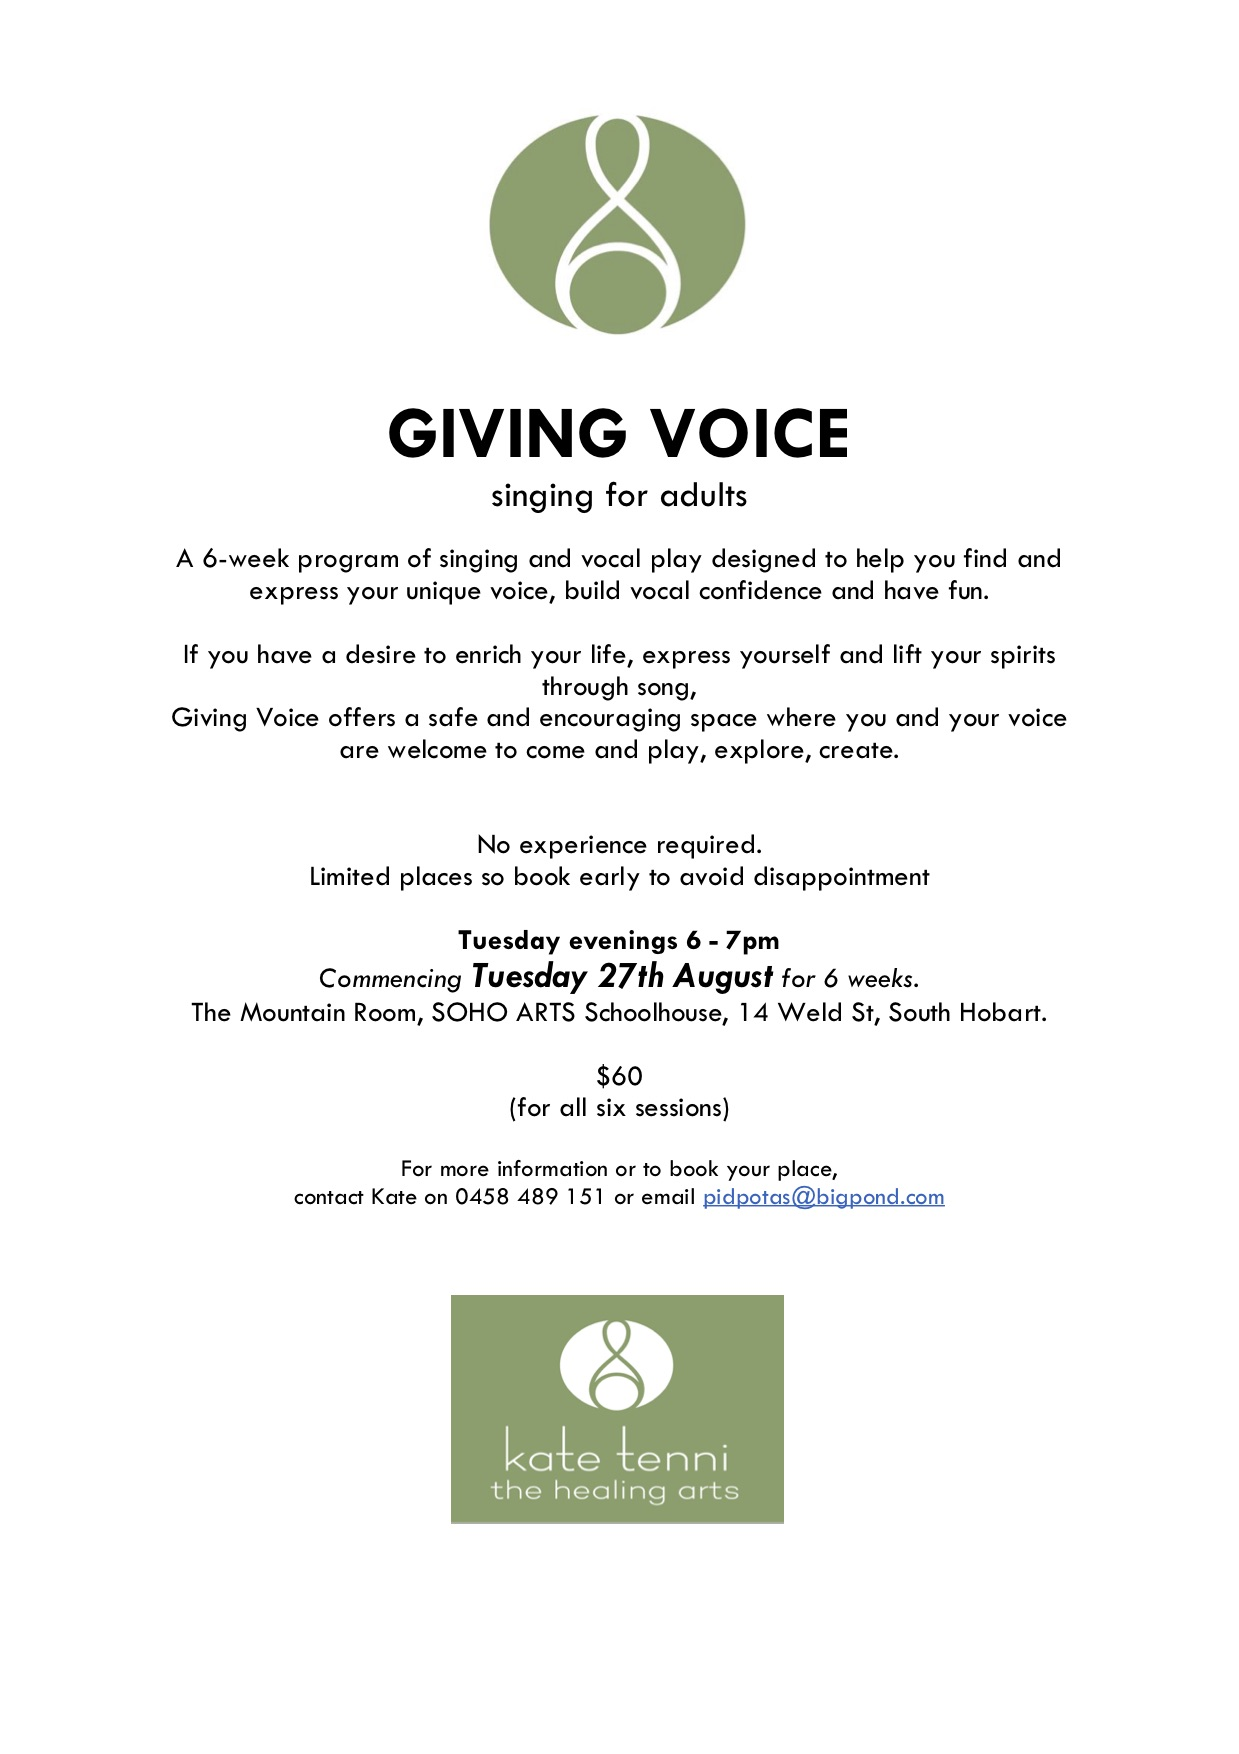 Giving Voice season 3 flyer.jpg